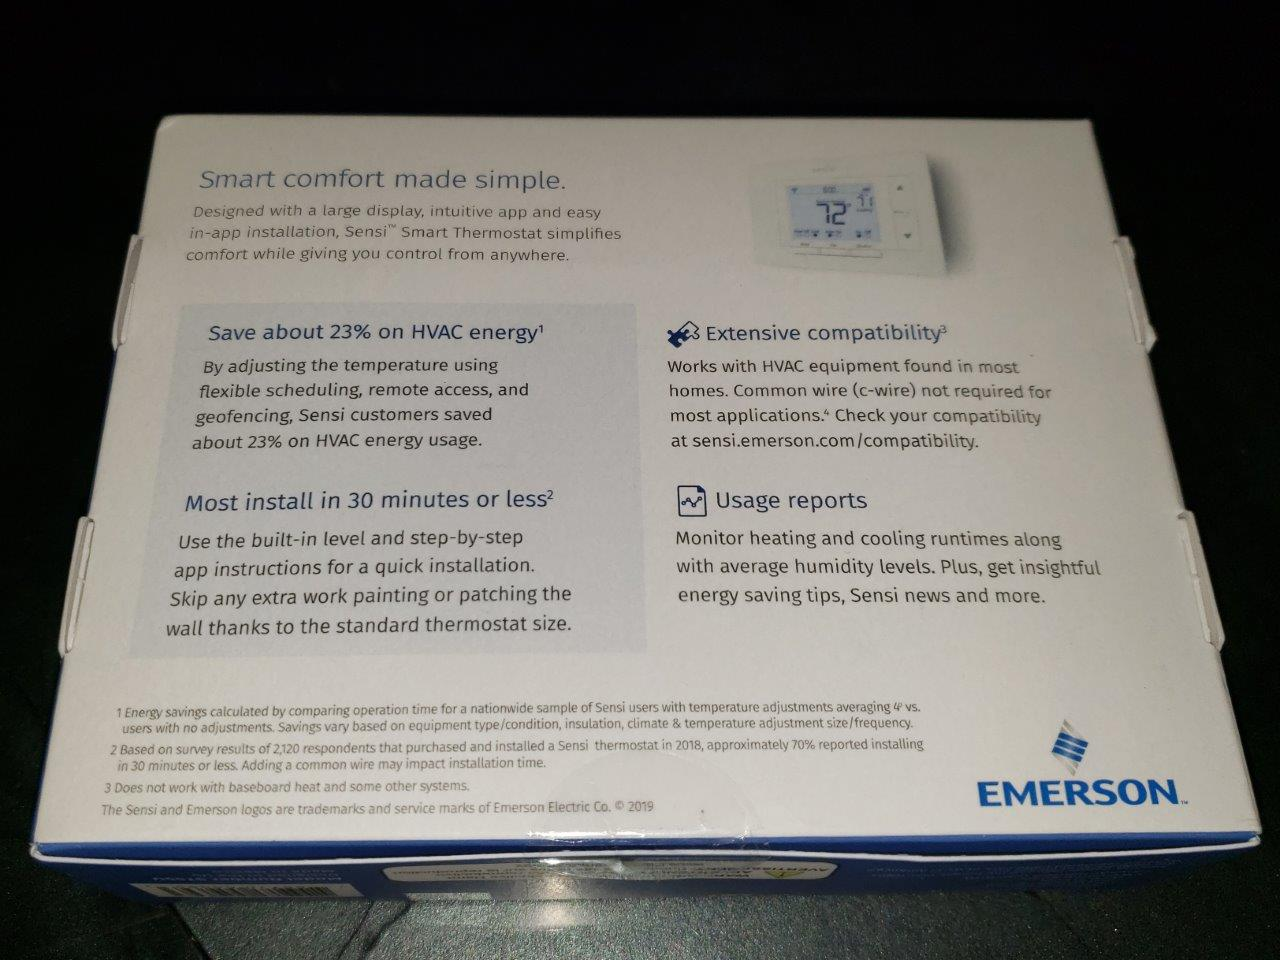 Emerson Sensi Smart Thermostat Model ST55U WIFI Smart Home, New Factory Sealed